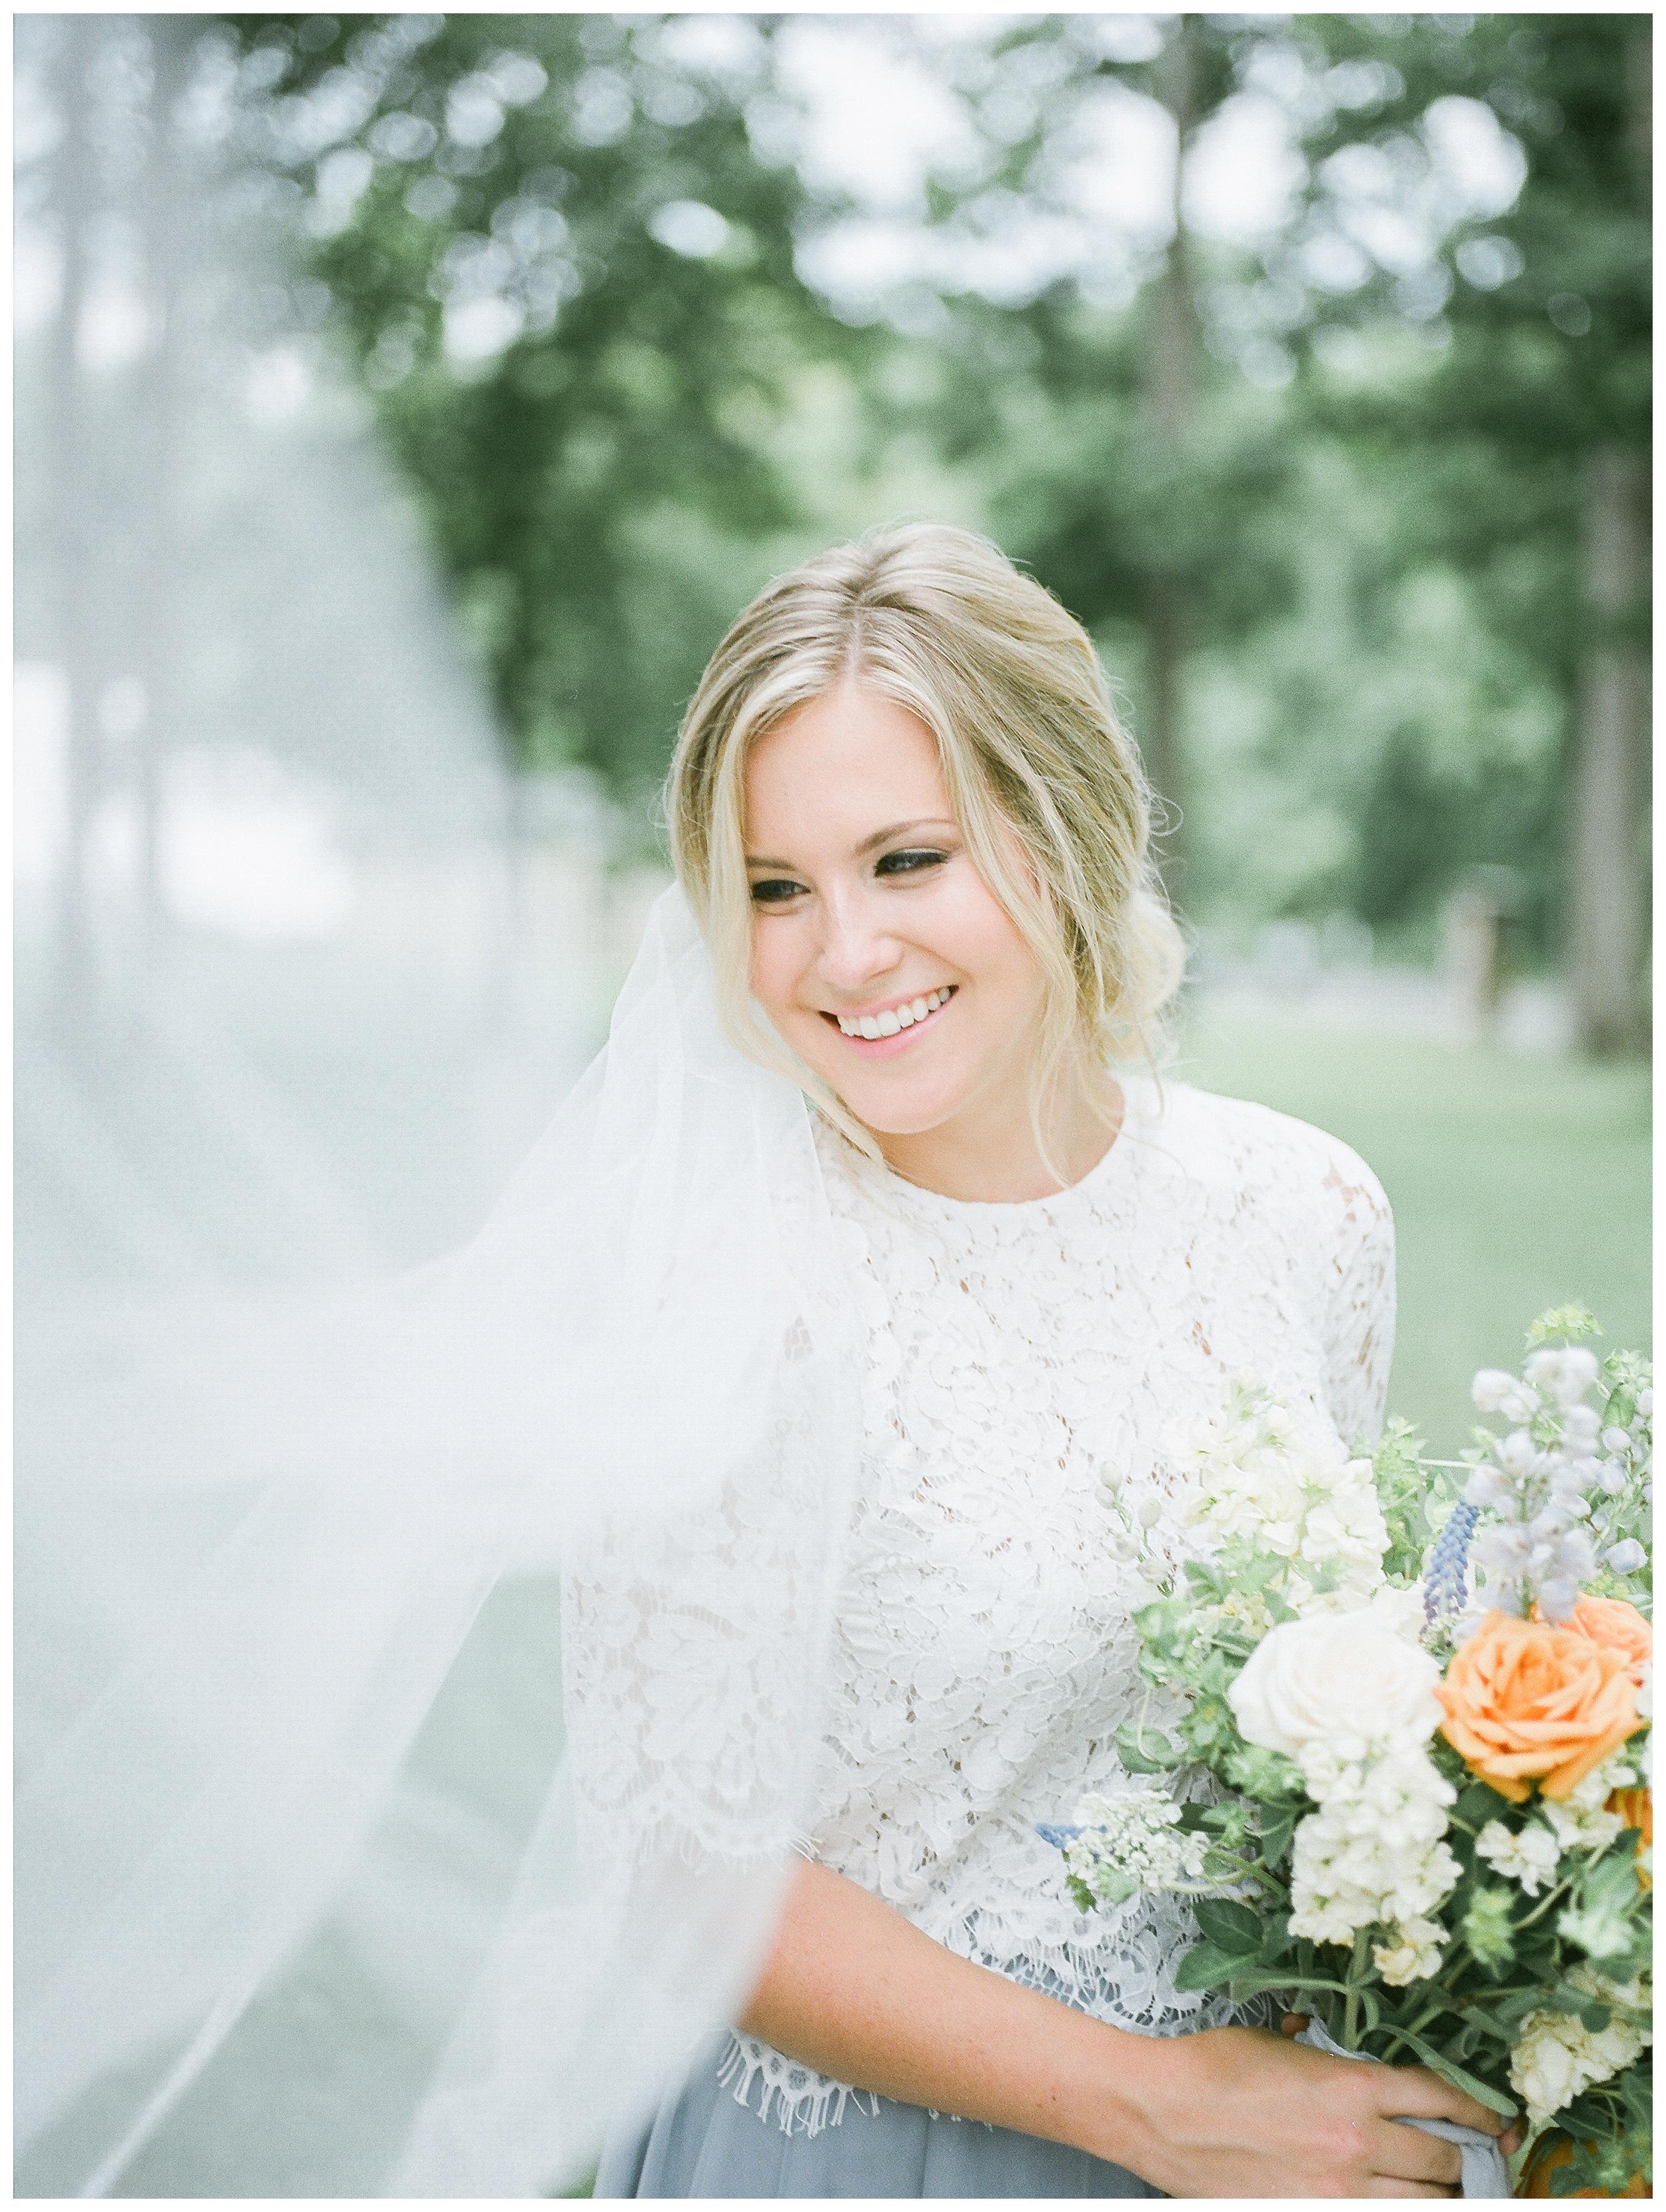 Rust Manor Wedding   Virginia Wedding Photographer Kir Tuben_0011.jpg